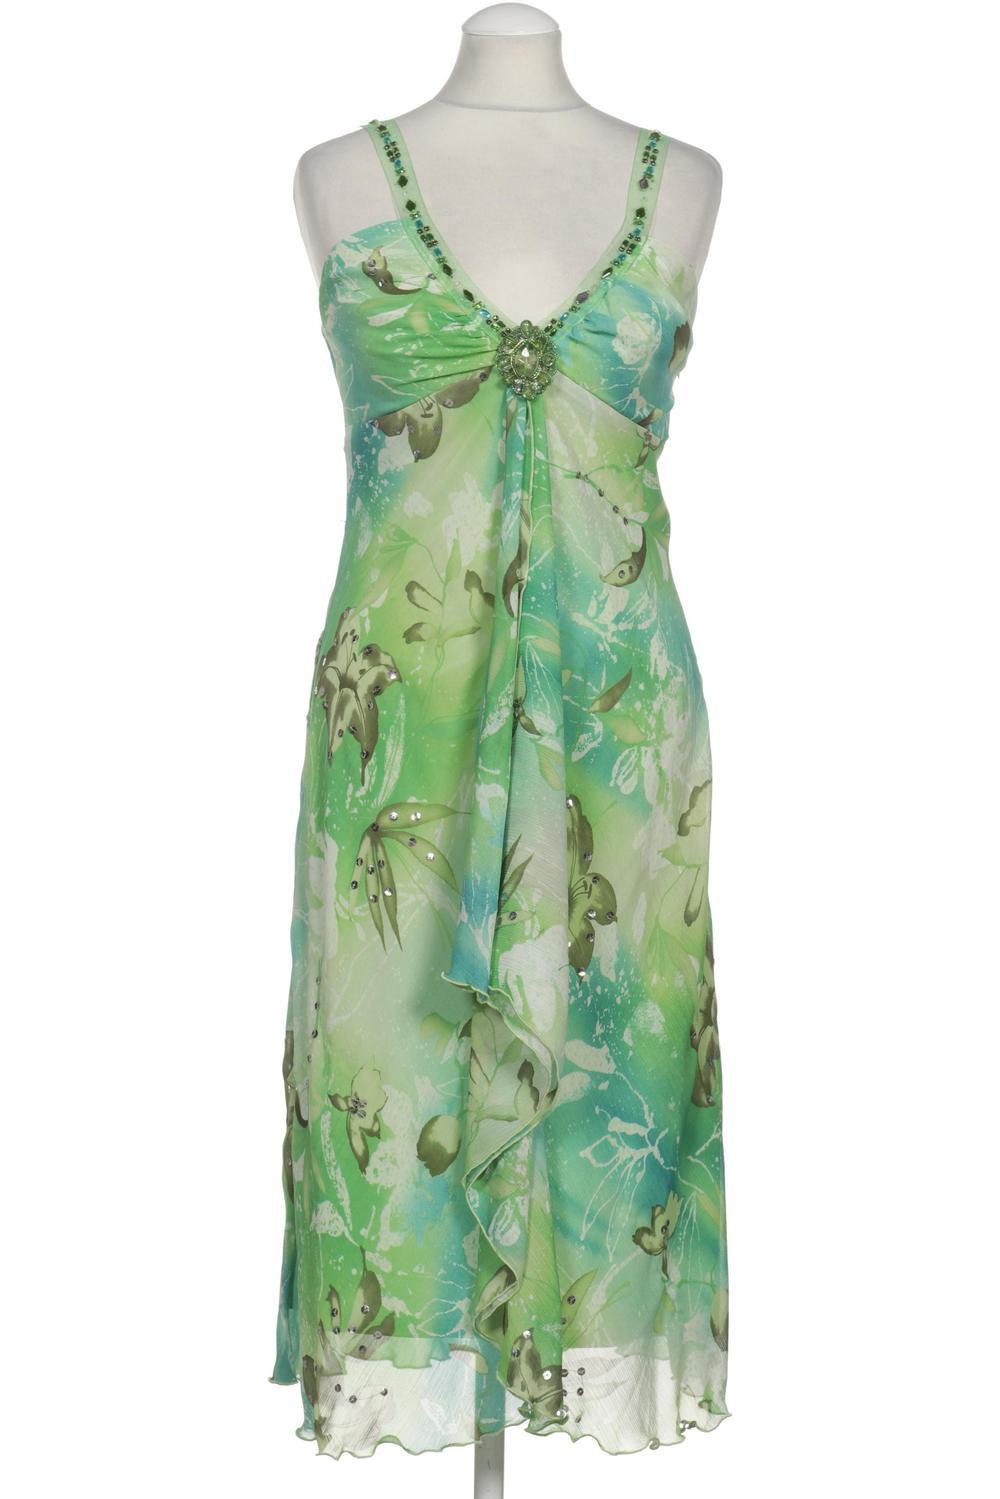 Joseph Ribkoff Damen Kleid DE 38 Second Hand kaufen | ubup